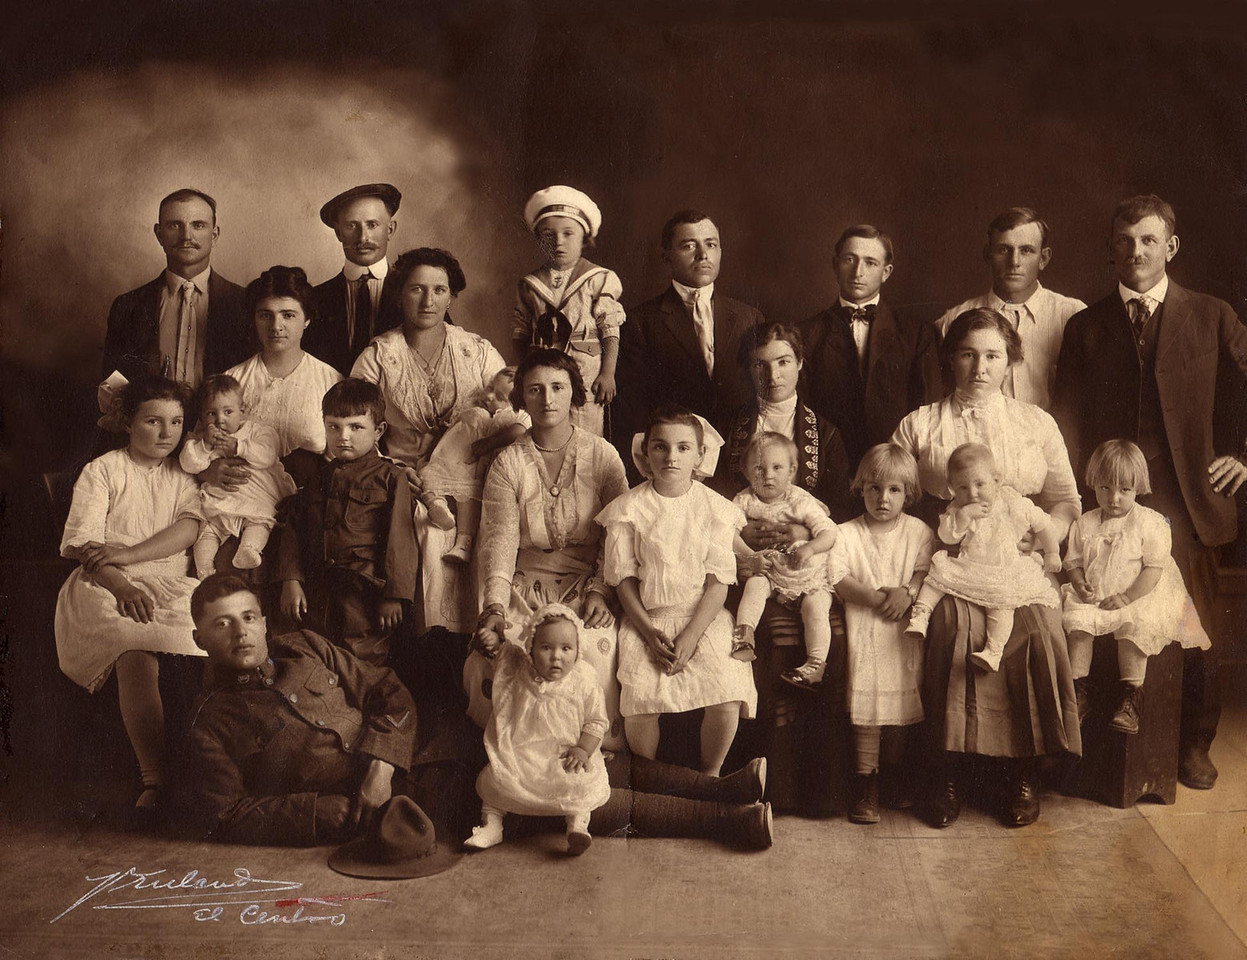 El Centro, California 1918.